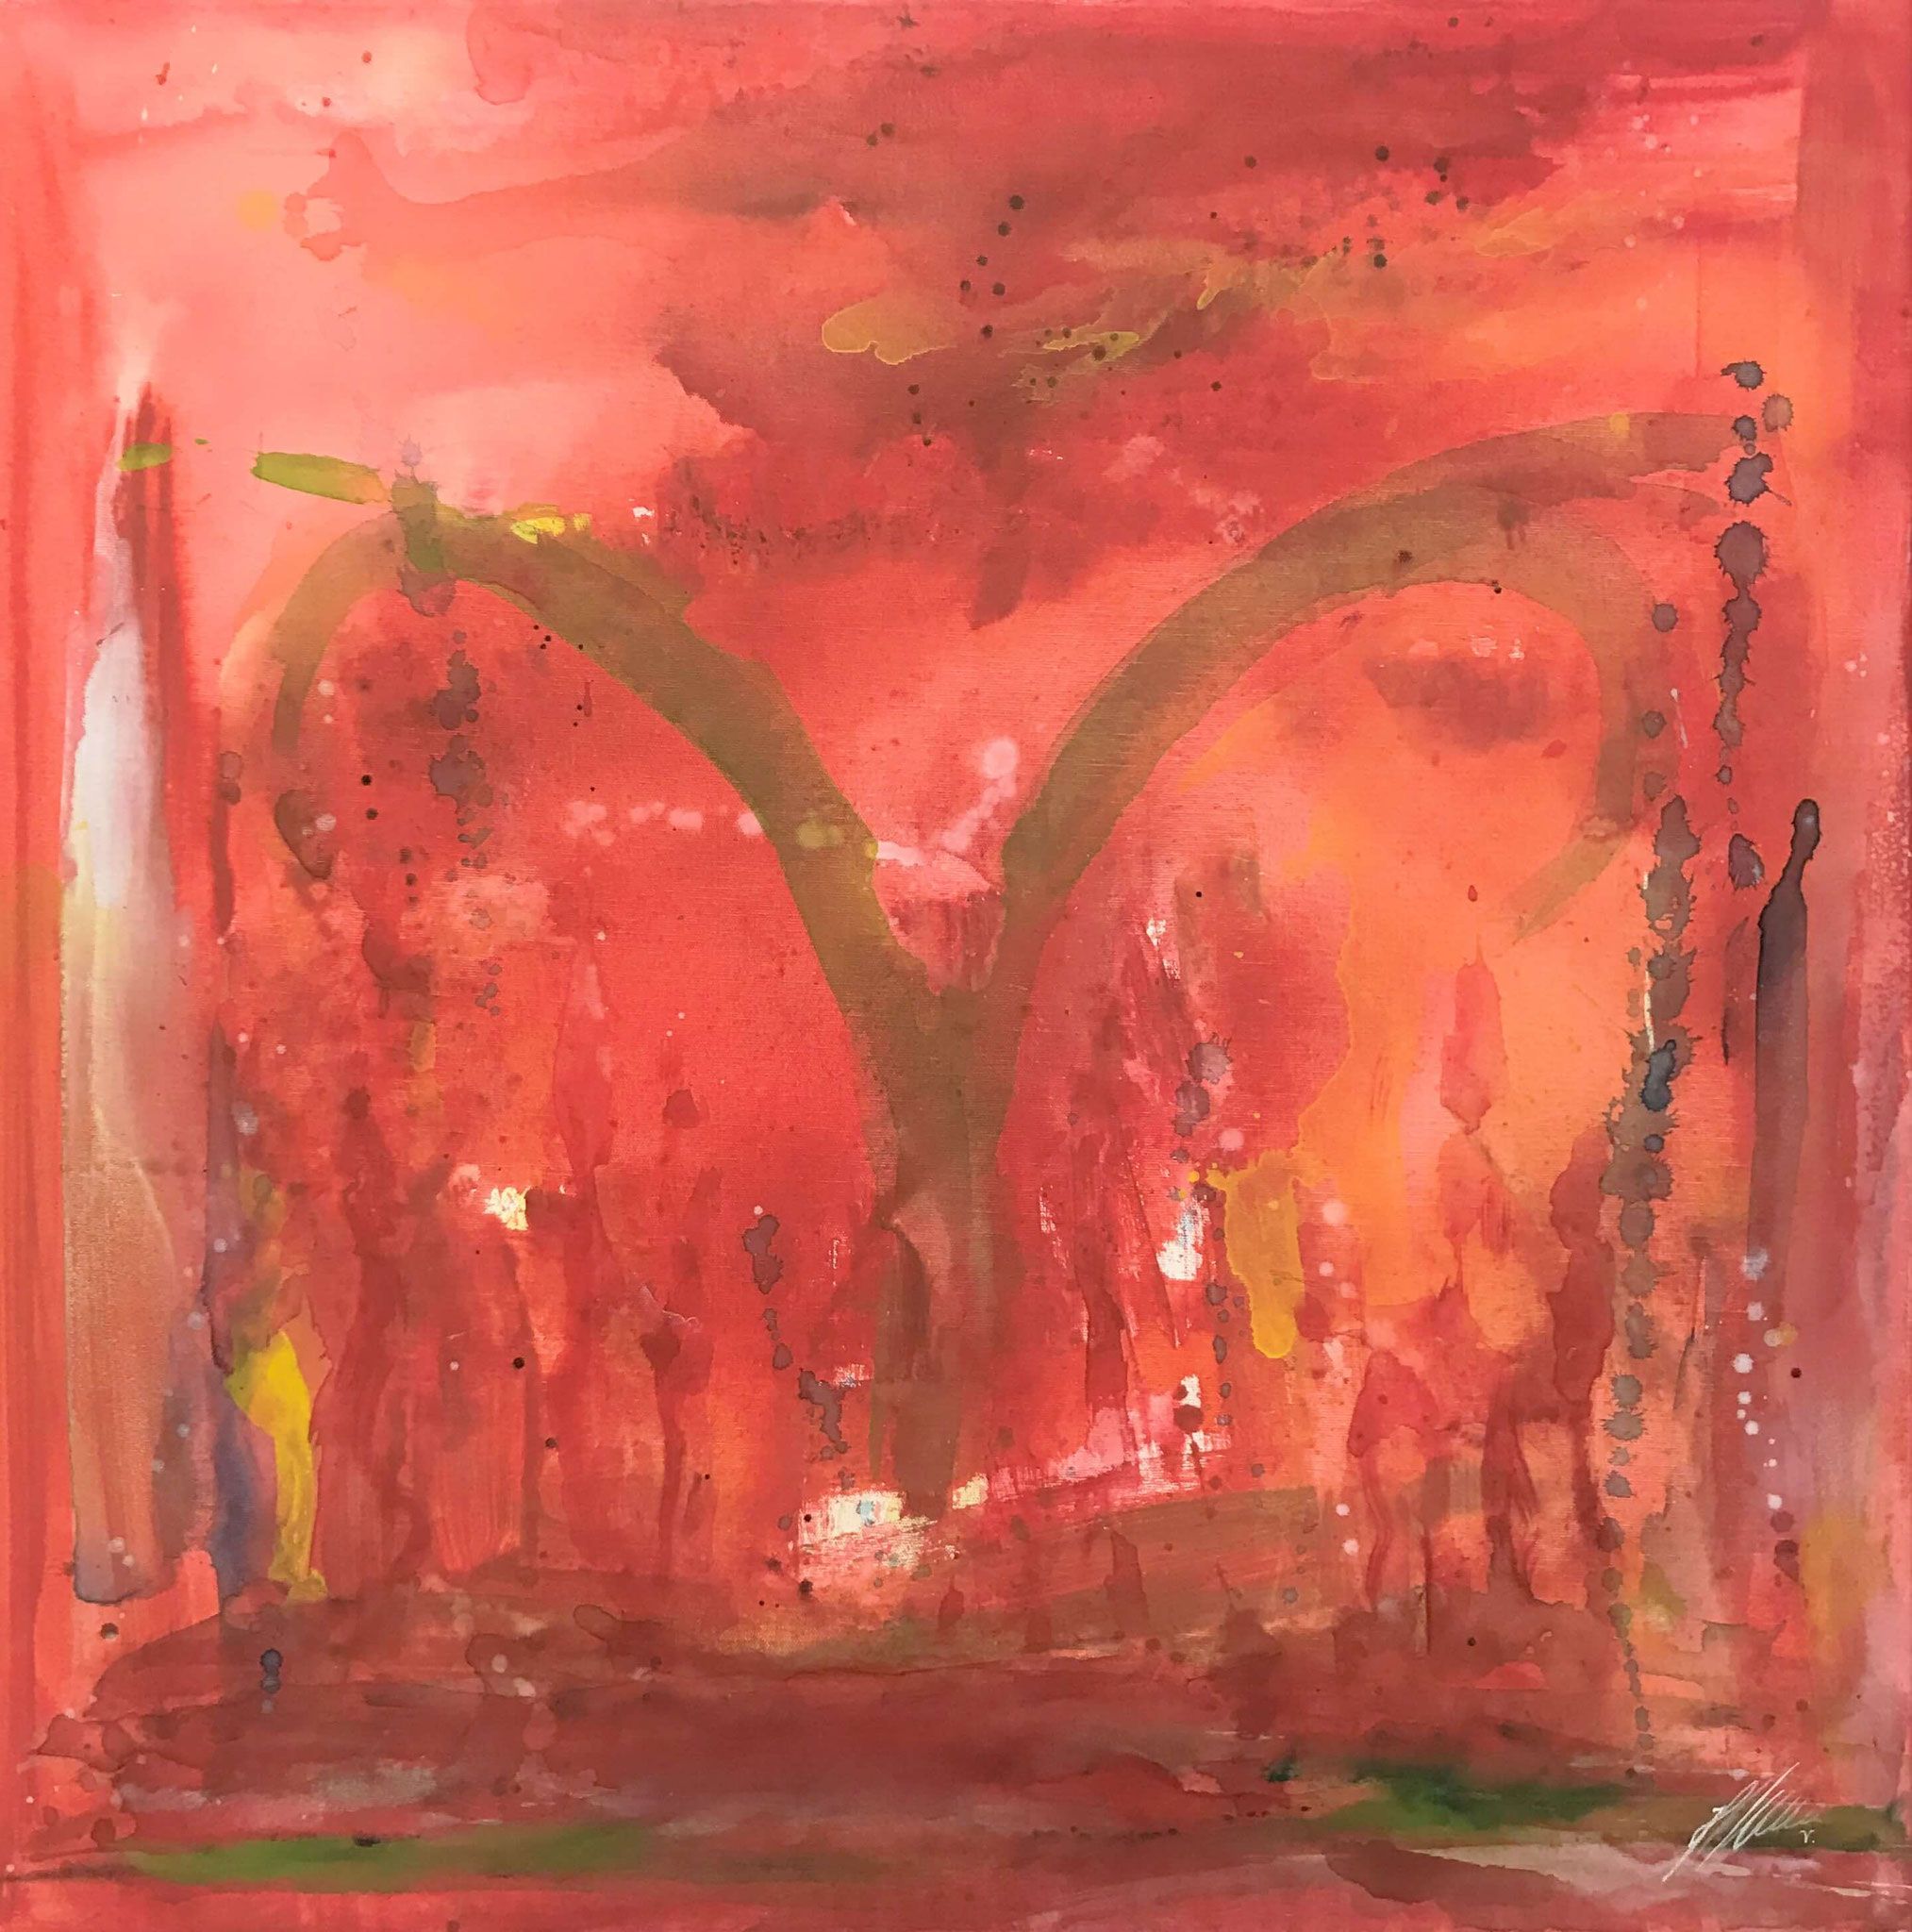 "Fr. 560.00 ""Widder, Serie abstract"" Acryl auf Leinwand mit Rahmen 80 x 80 cm."